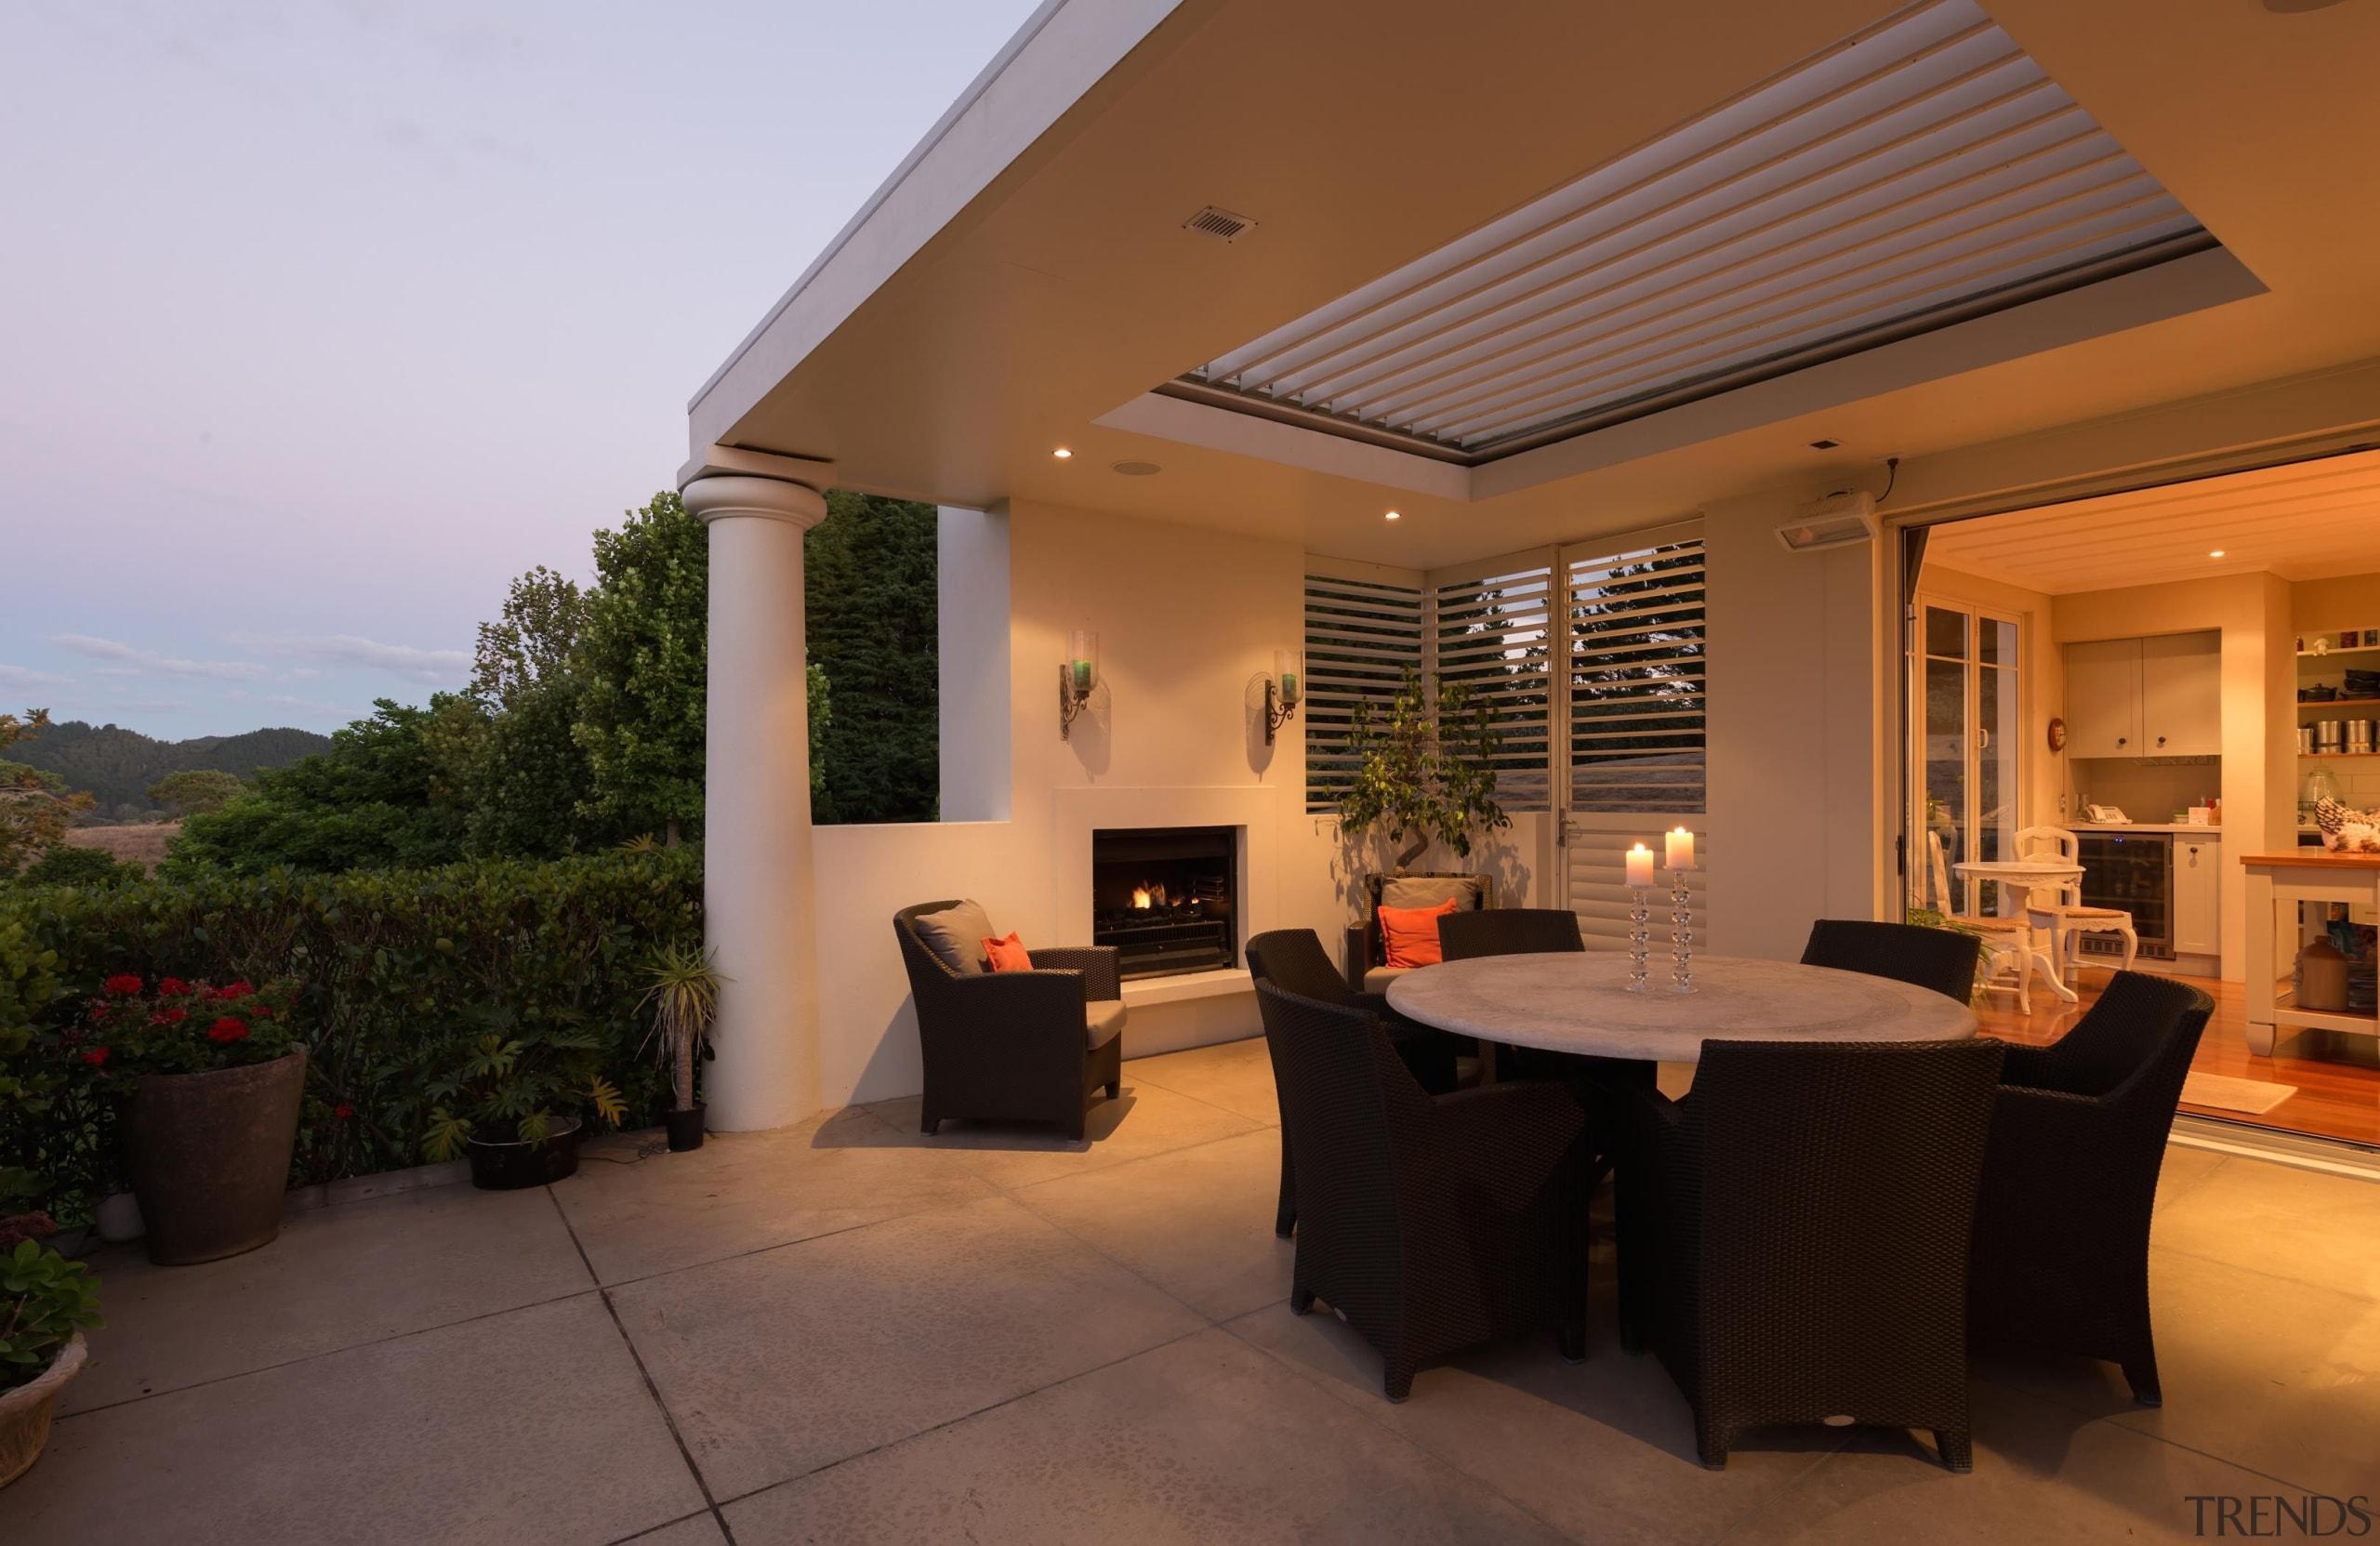 img1141.jpg - img1141.jpg - apartment   estate   apartment, estate, home, house, interior design, patio, property, real estate, brown